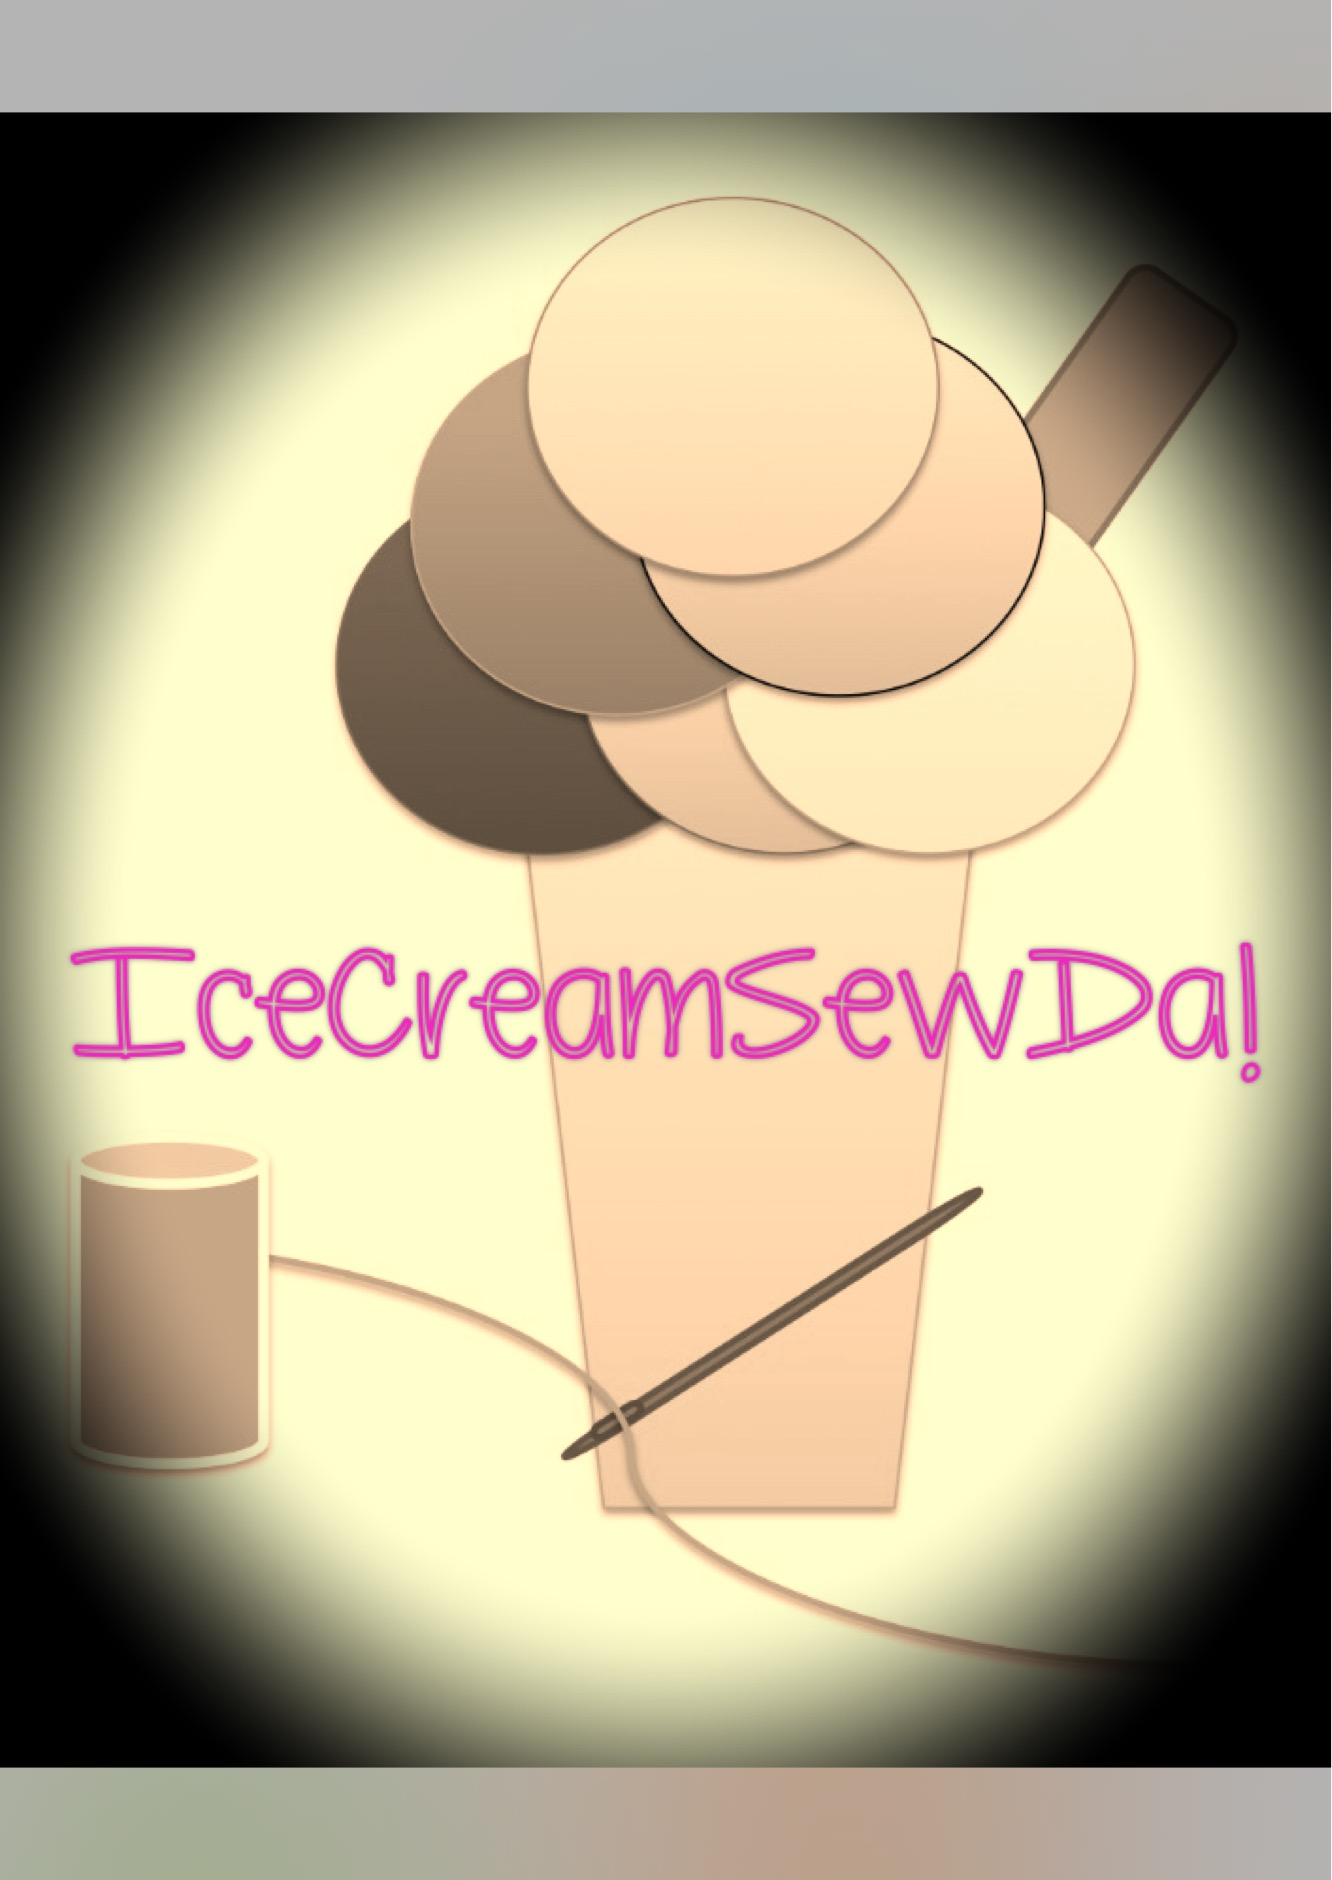 IceCreamSewDa